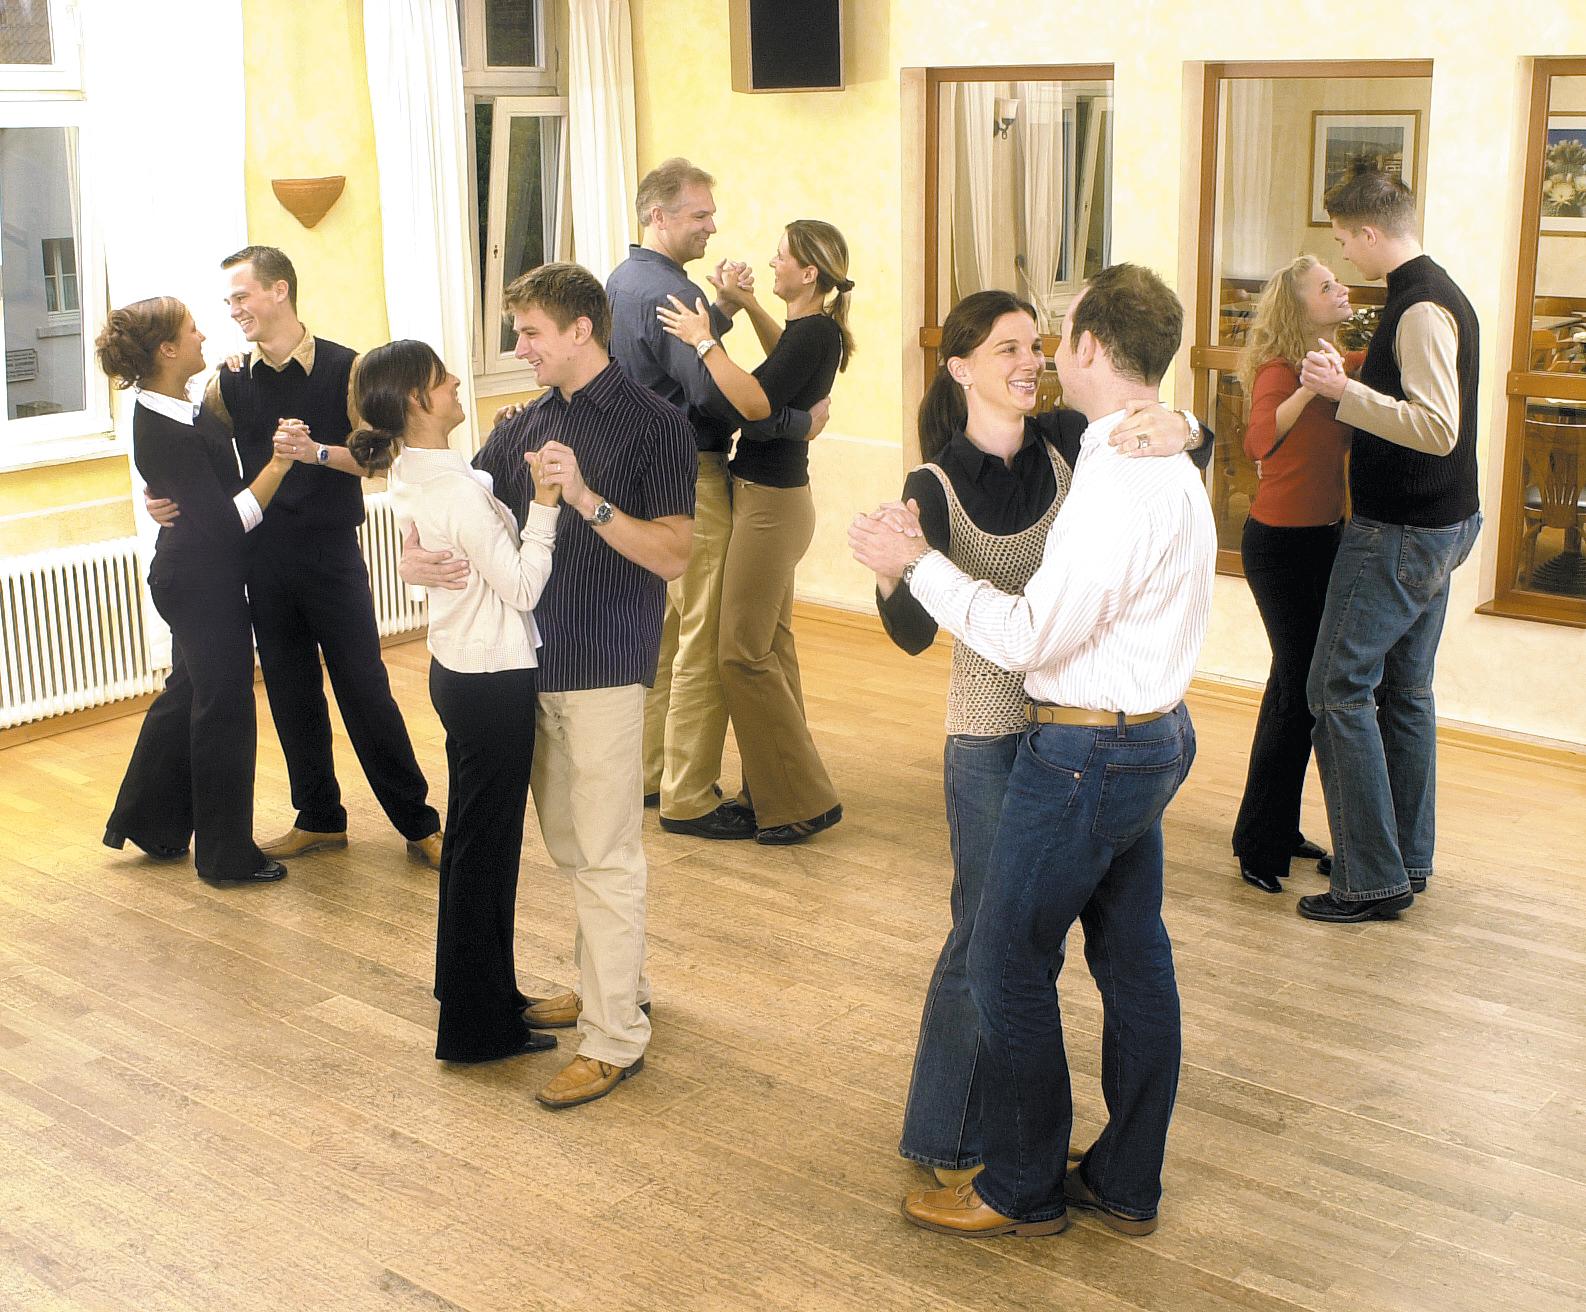 Tanzschule Kaechele Leverkusen   Tanzkurse, Zumba, Fitness, Ballett